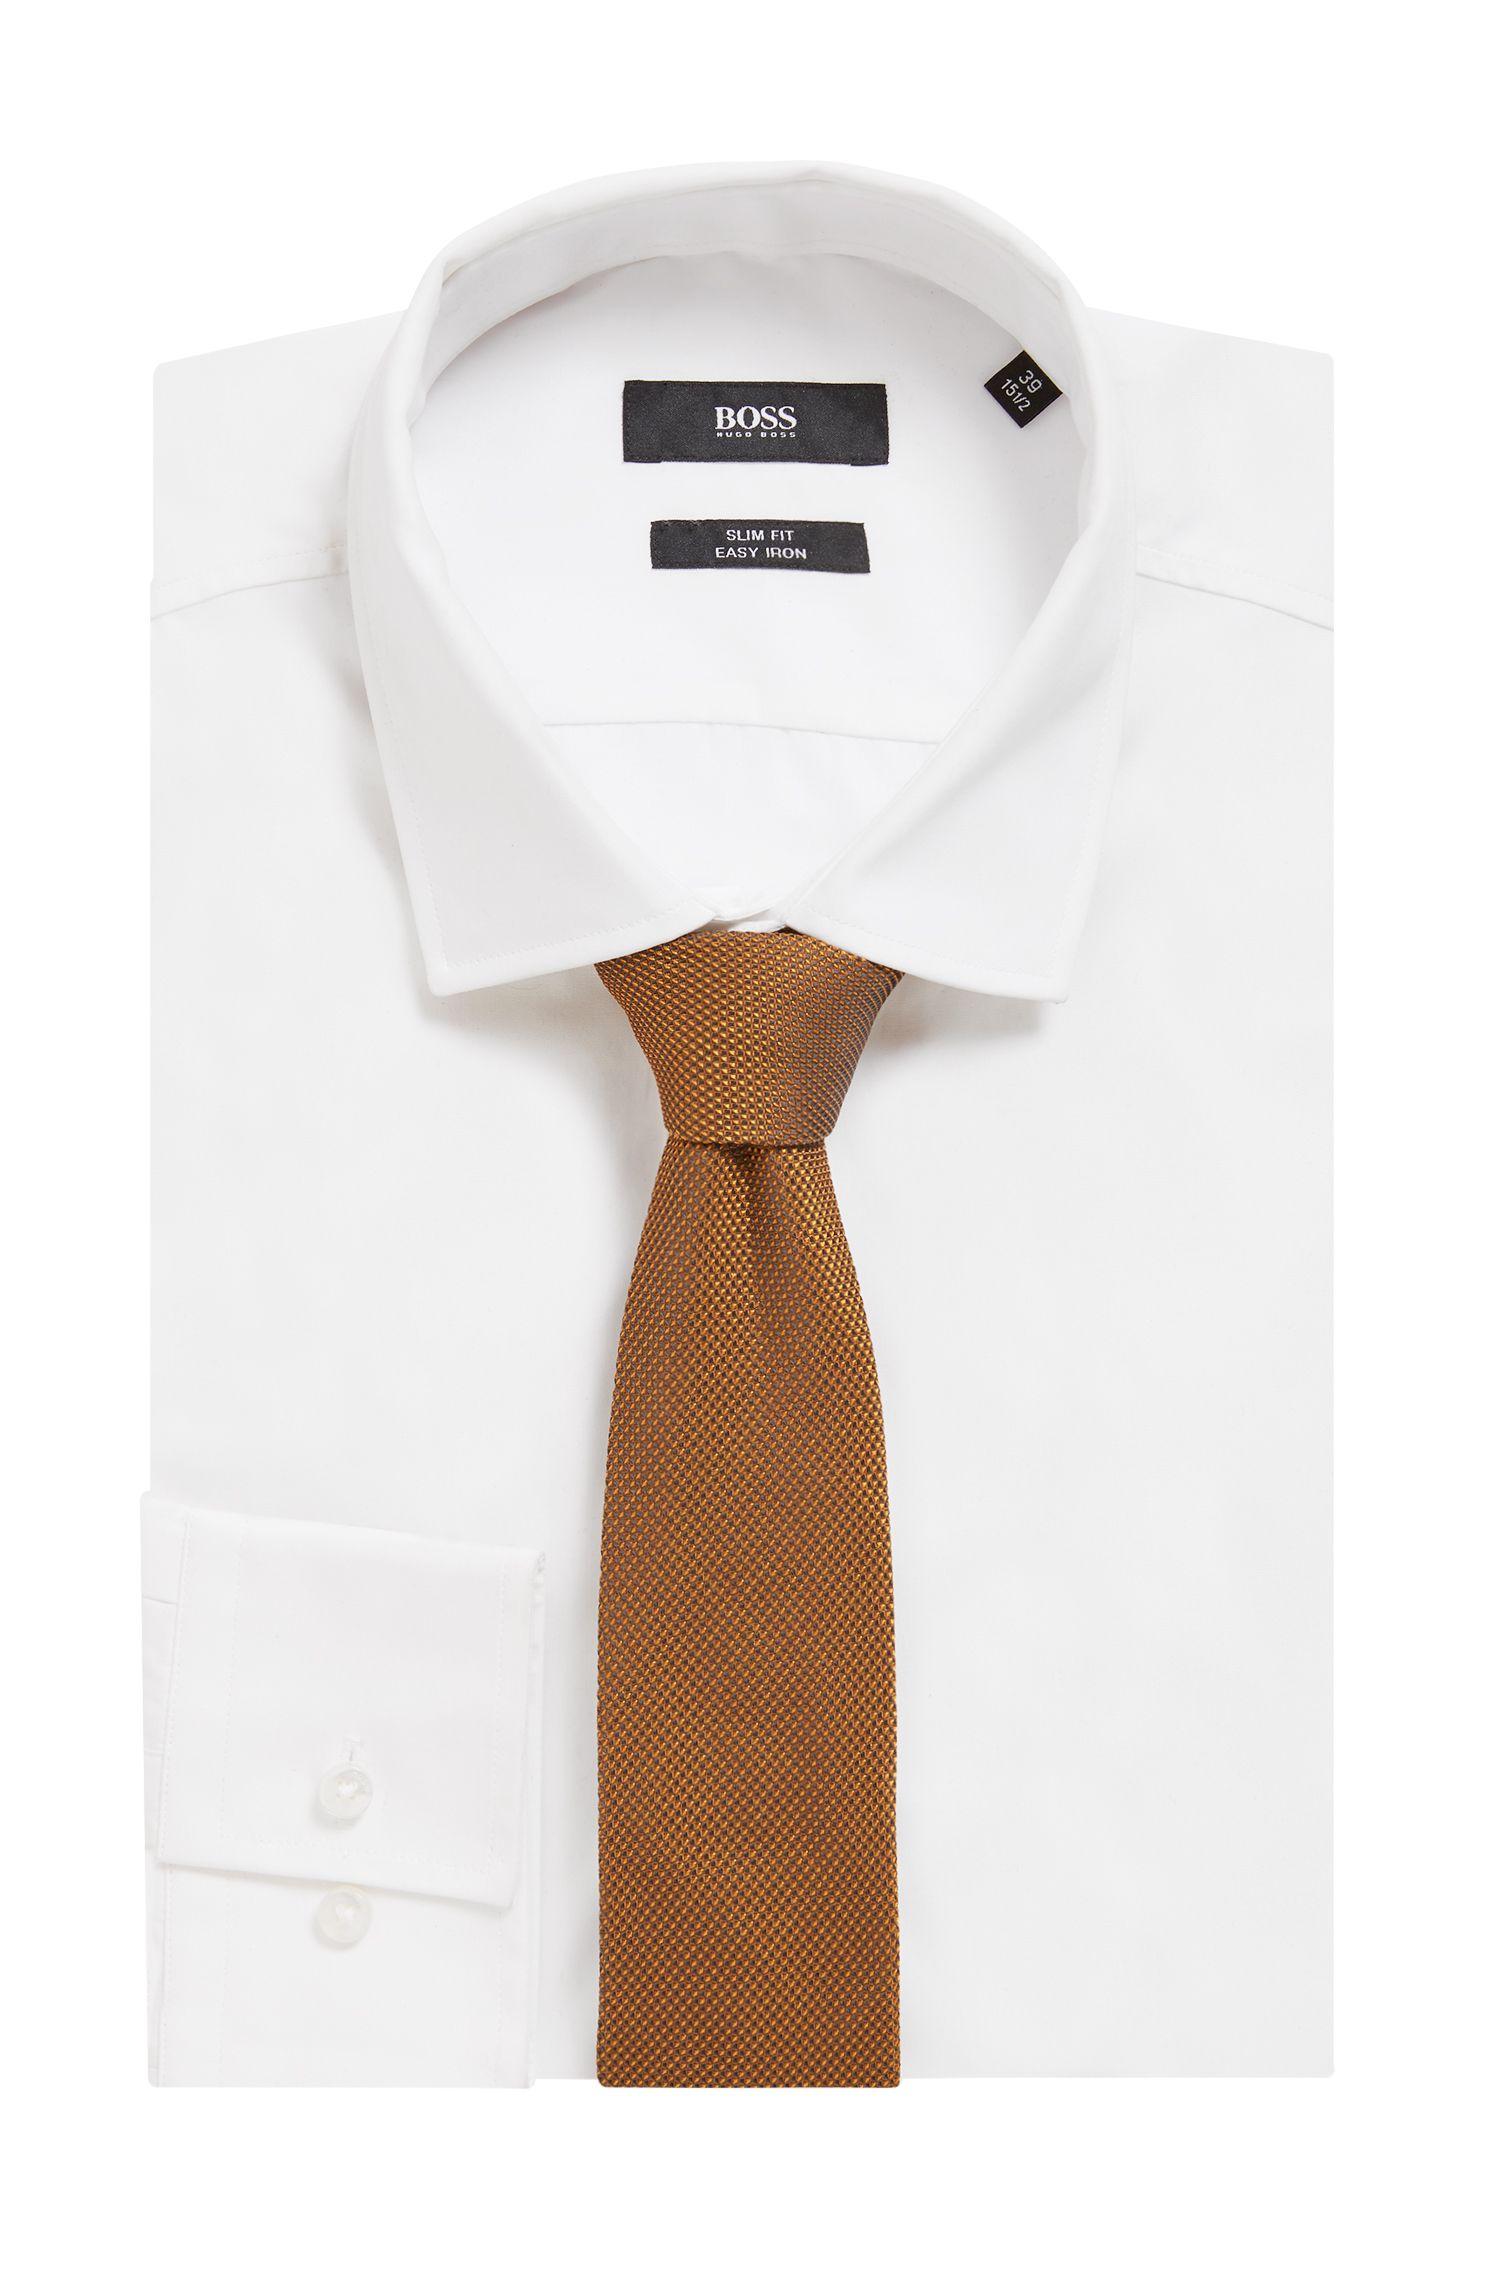 Corbata elaborada en Italia con jacquard de seda, amarillo oscuro